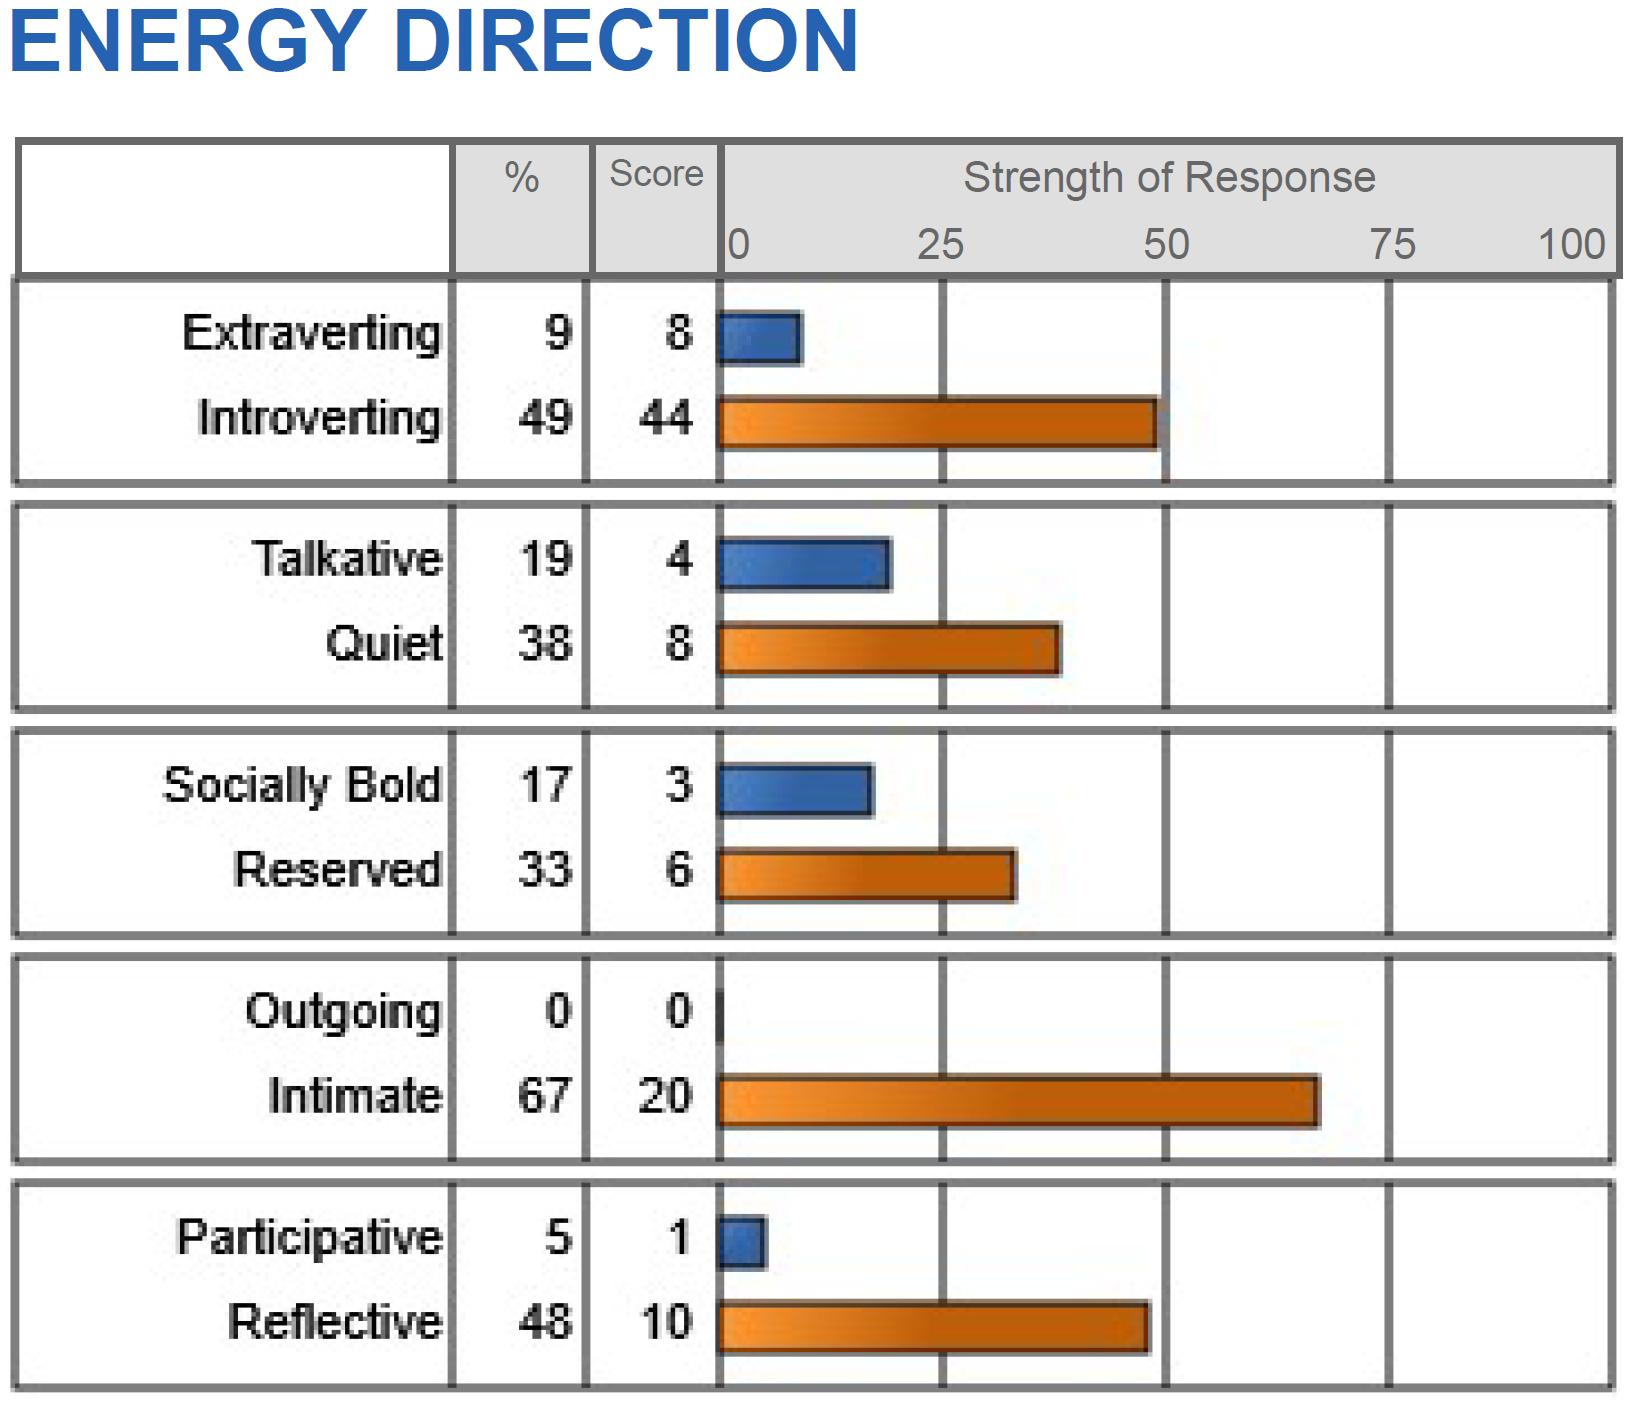 Energy Direction